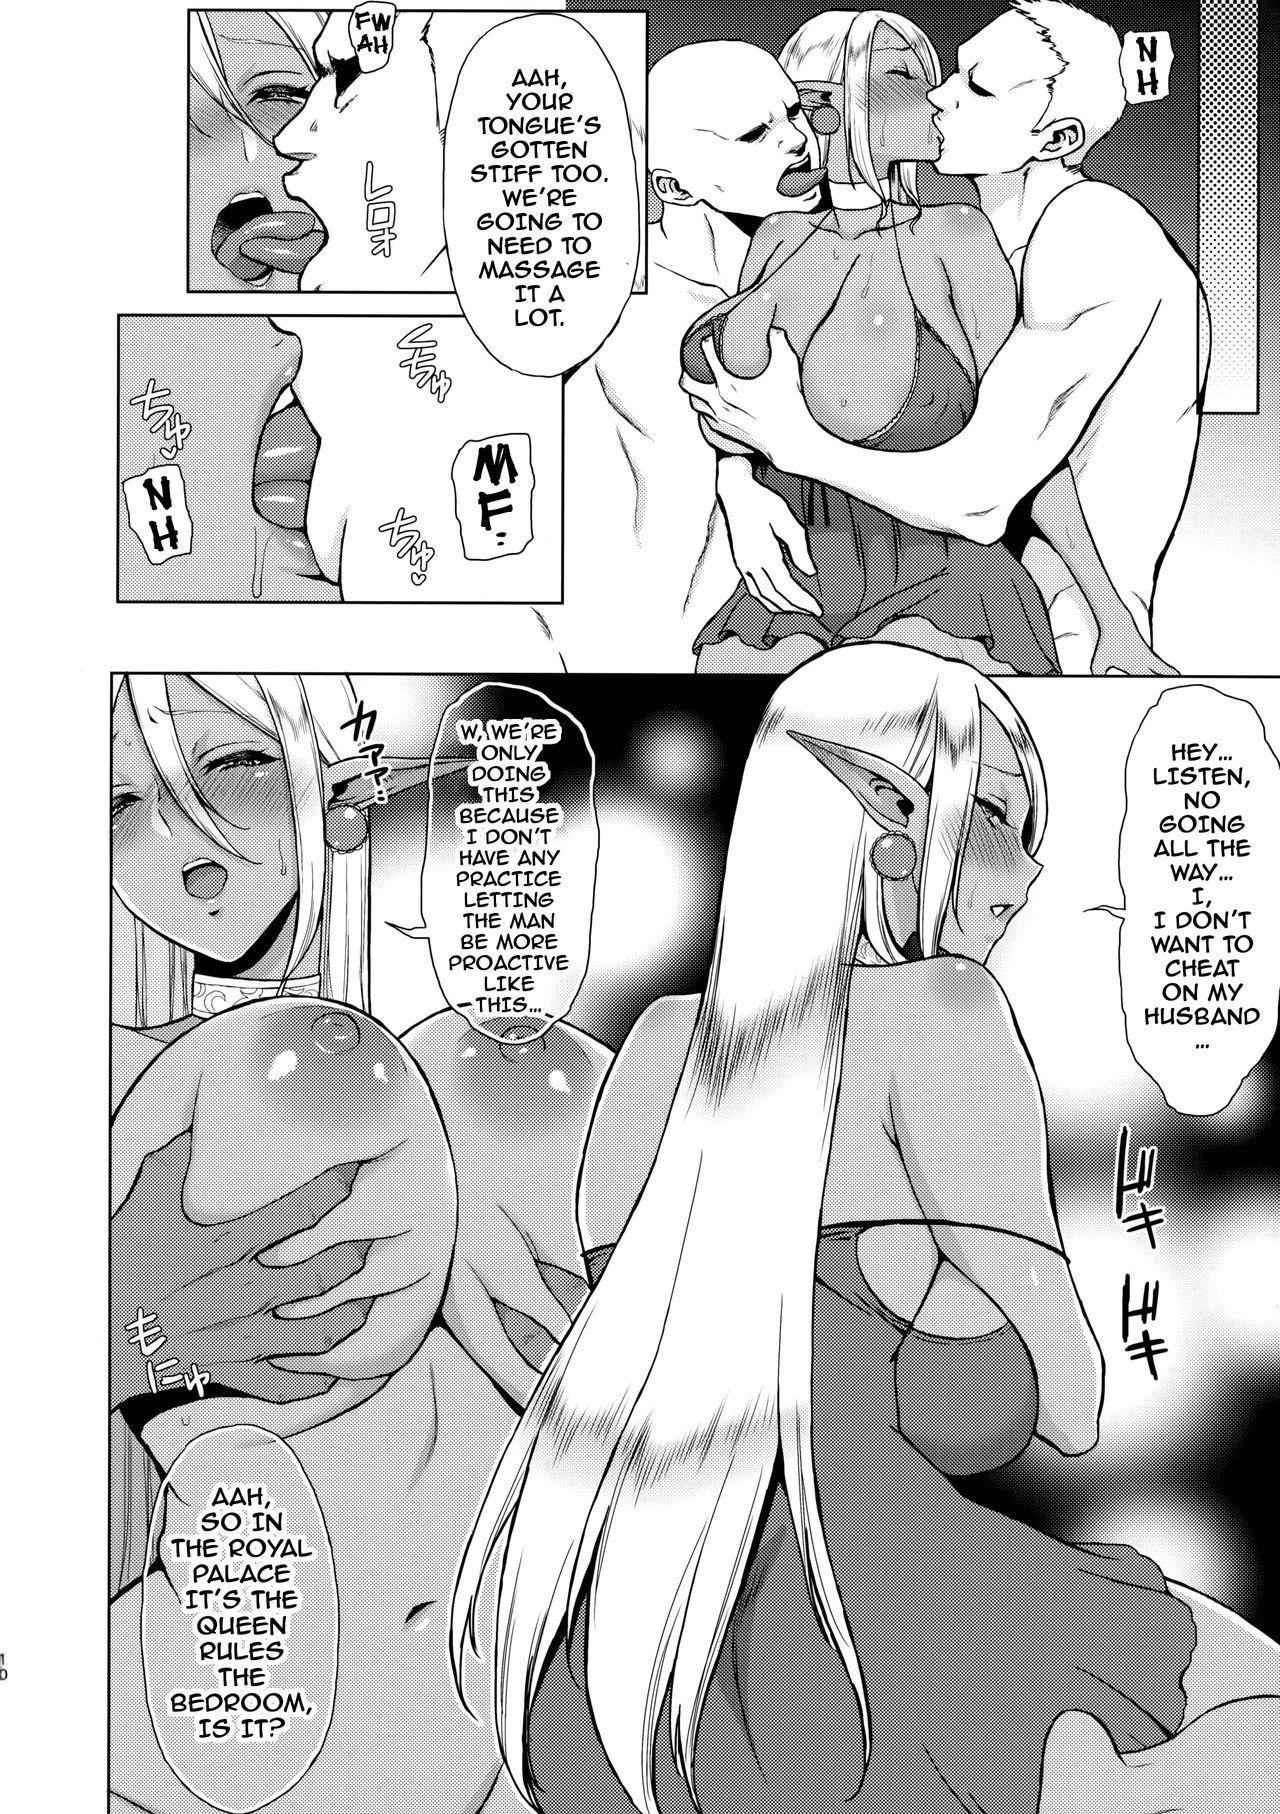 (C90) [H.B.A (Usagi Nagomu)] Inka -Nikuyoku ni Aragaenai Karada- + C90 Kaijou Genteibon   Flower of Lust -The Irresistible Desires of the Flesh- + C90 Assembly Hall Exclusive [English] [darknight] 8